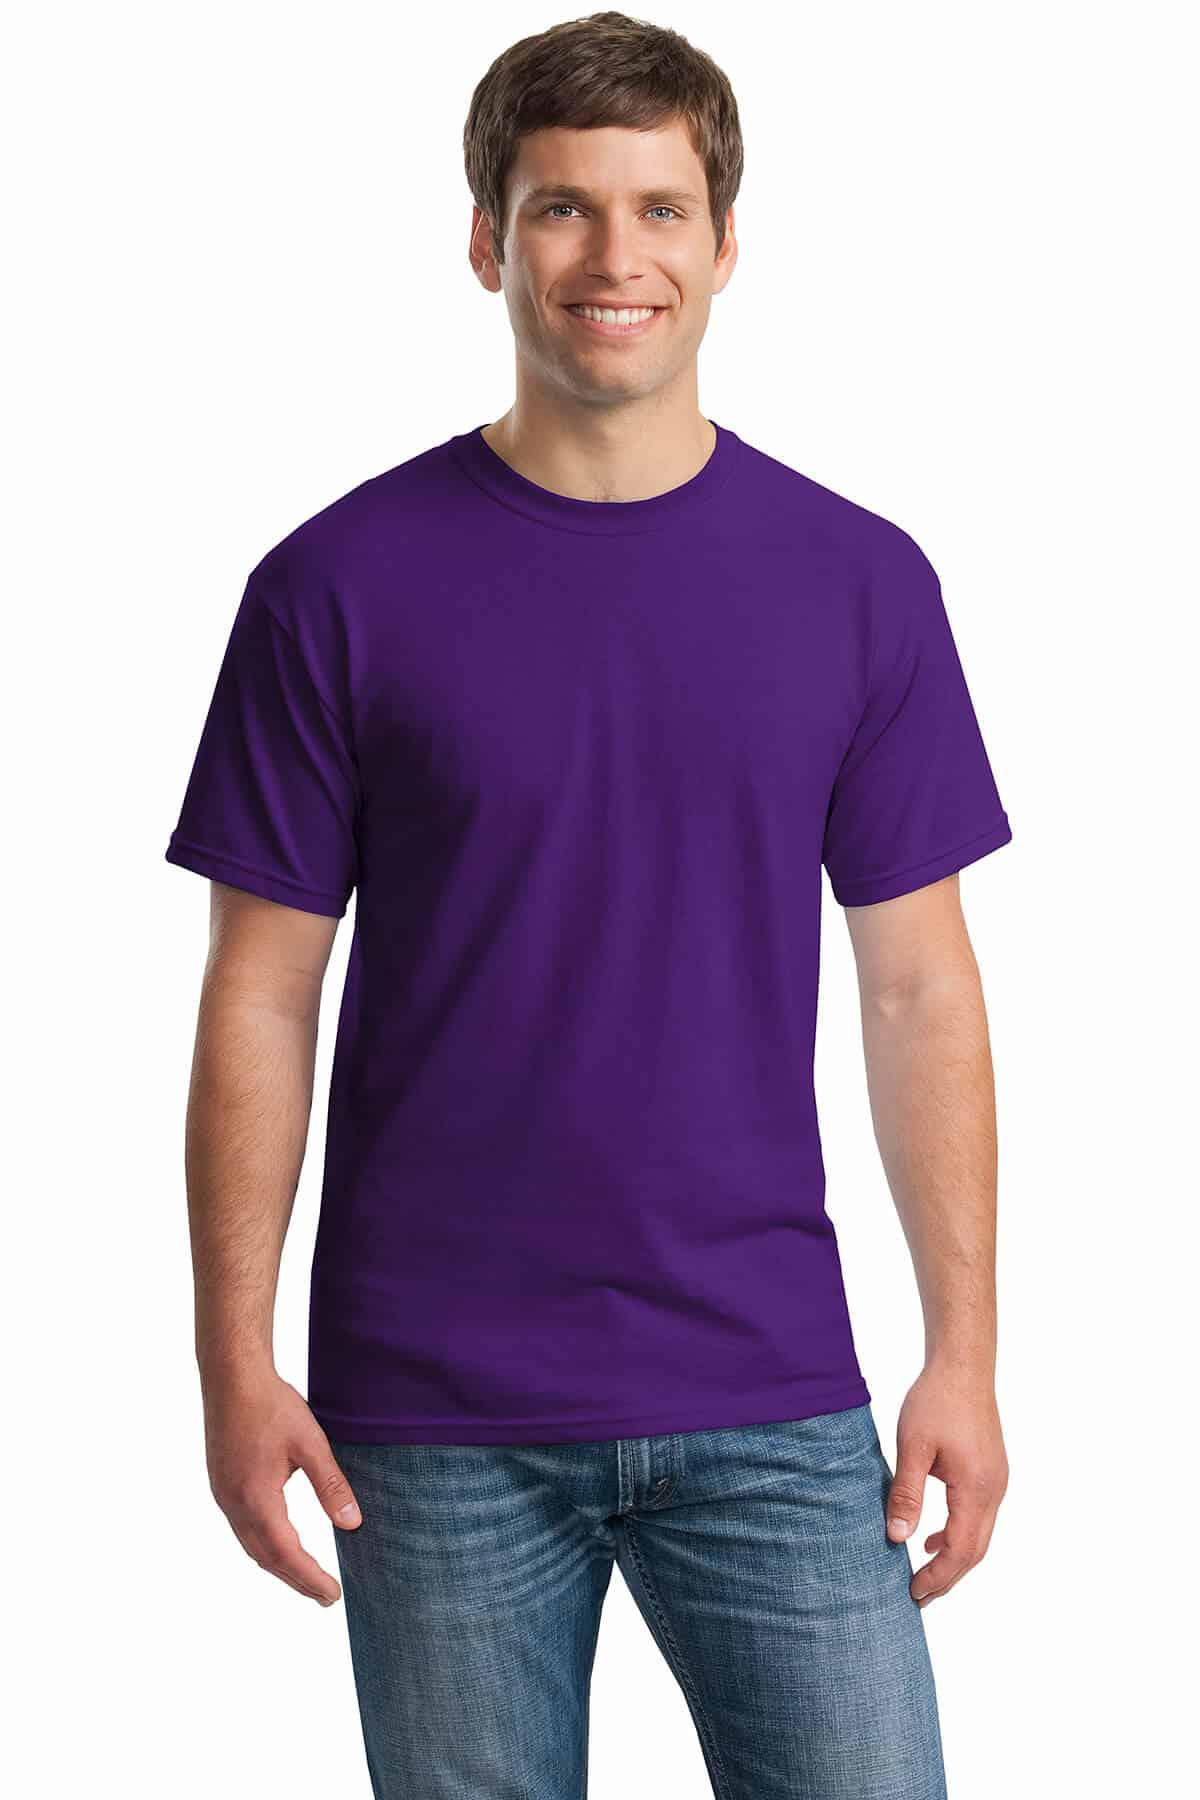 Purple Tee Front